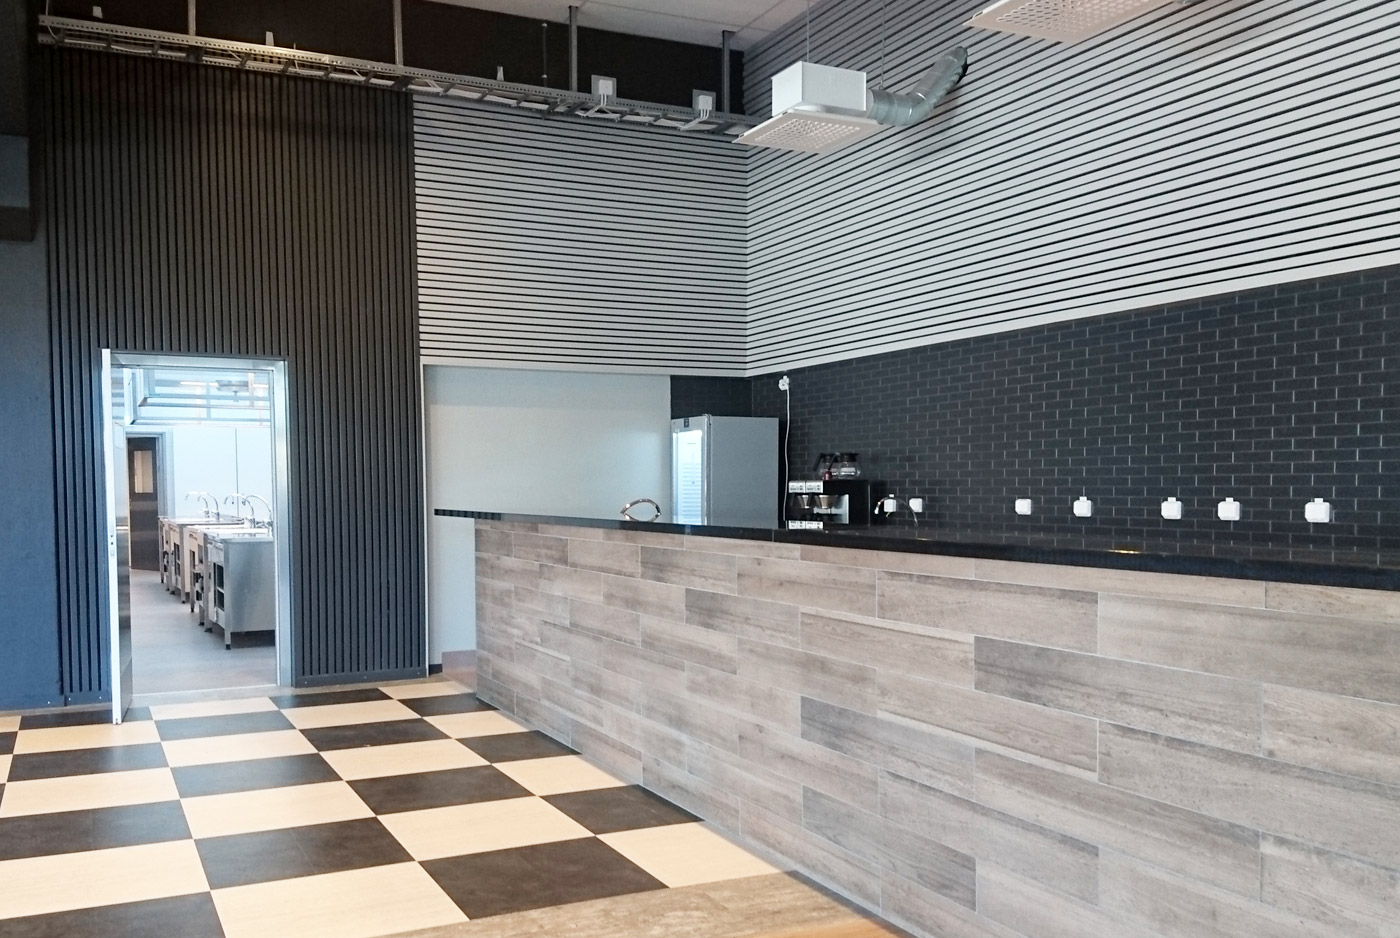 Heving & Hägglund - Byggprojekt - Åva Gymnasium Restaurangkök